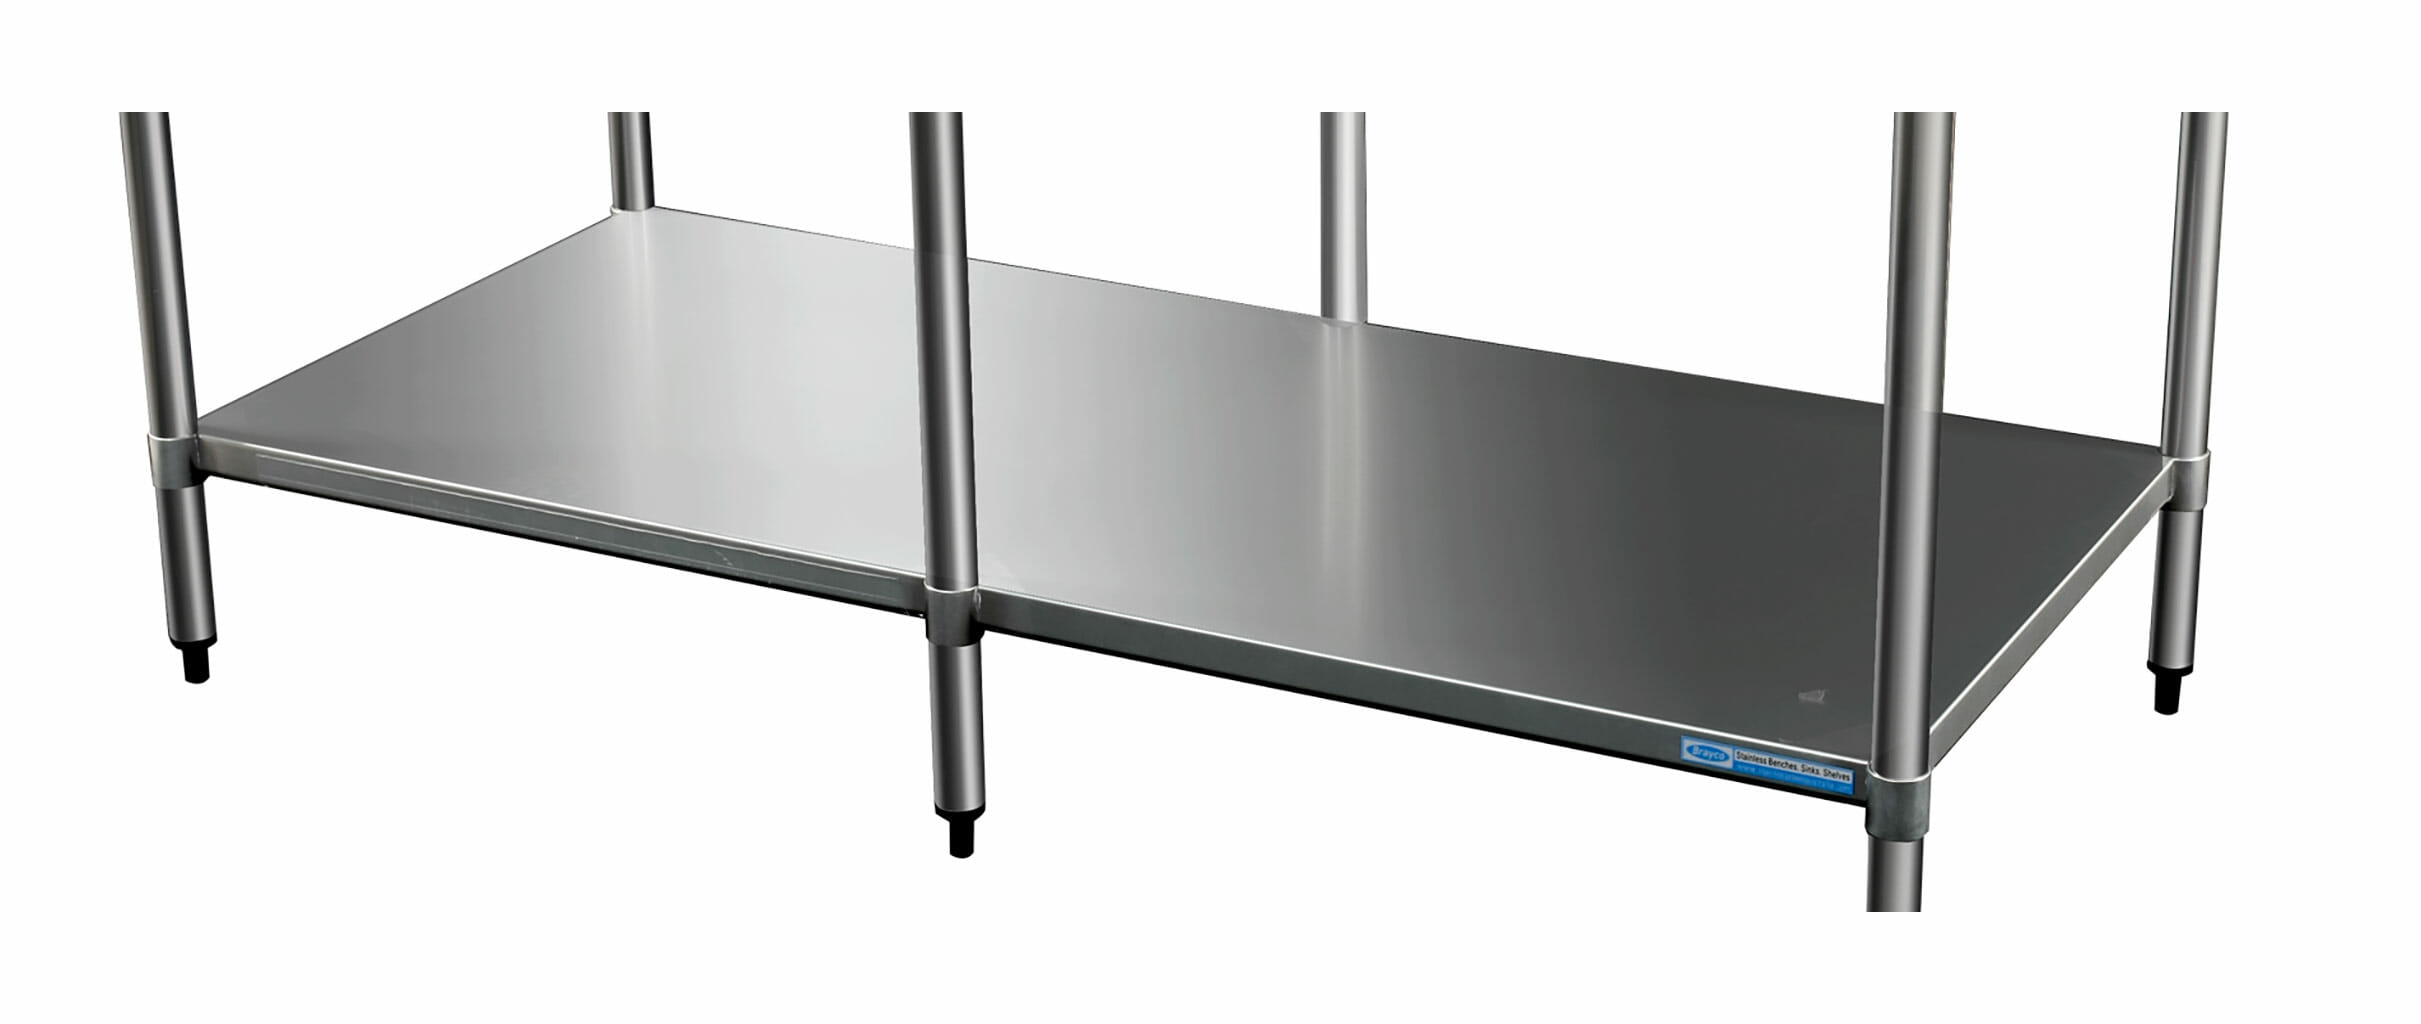 Stainless Undershelf for 3684 Bench